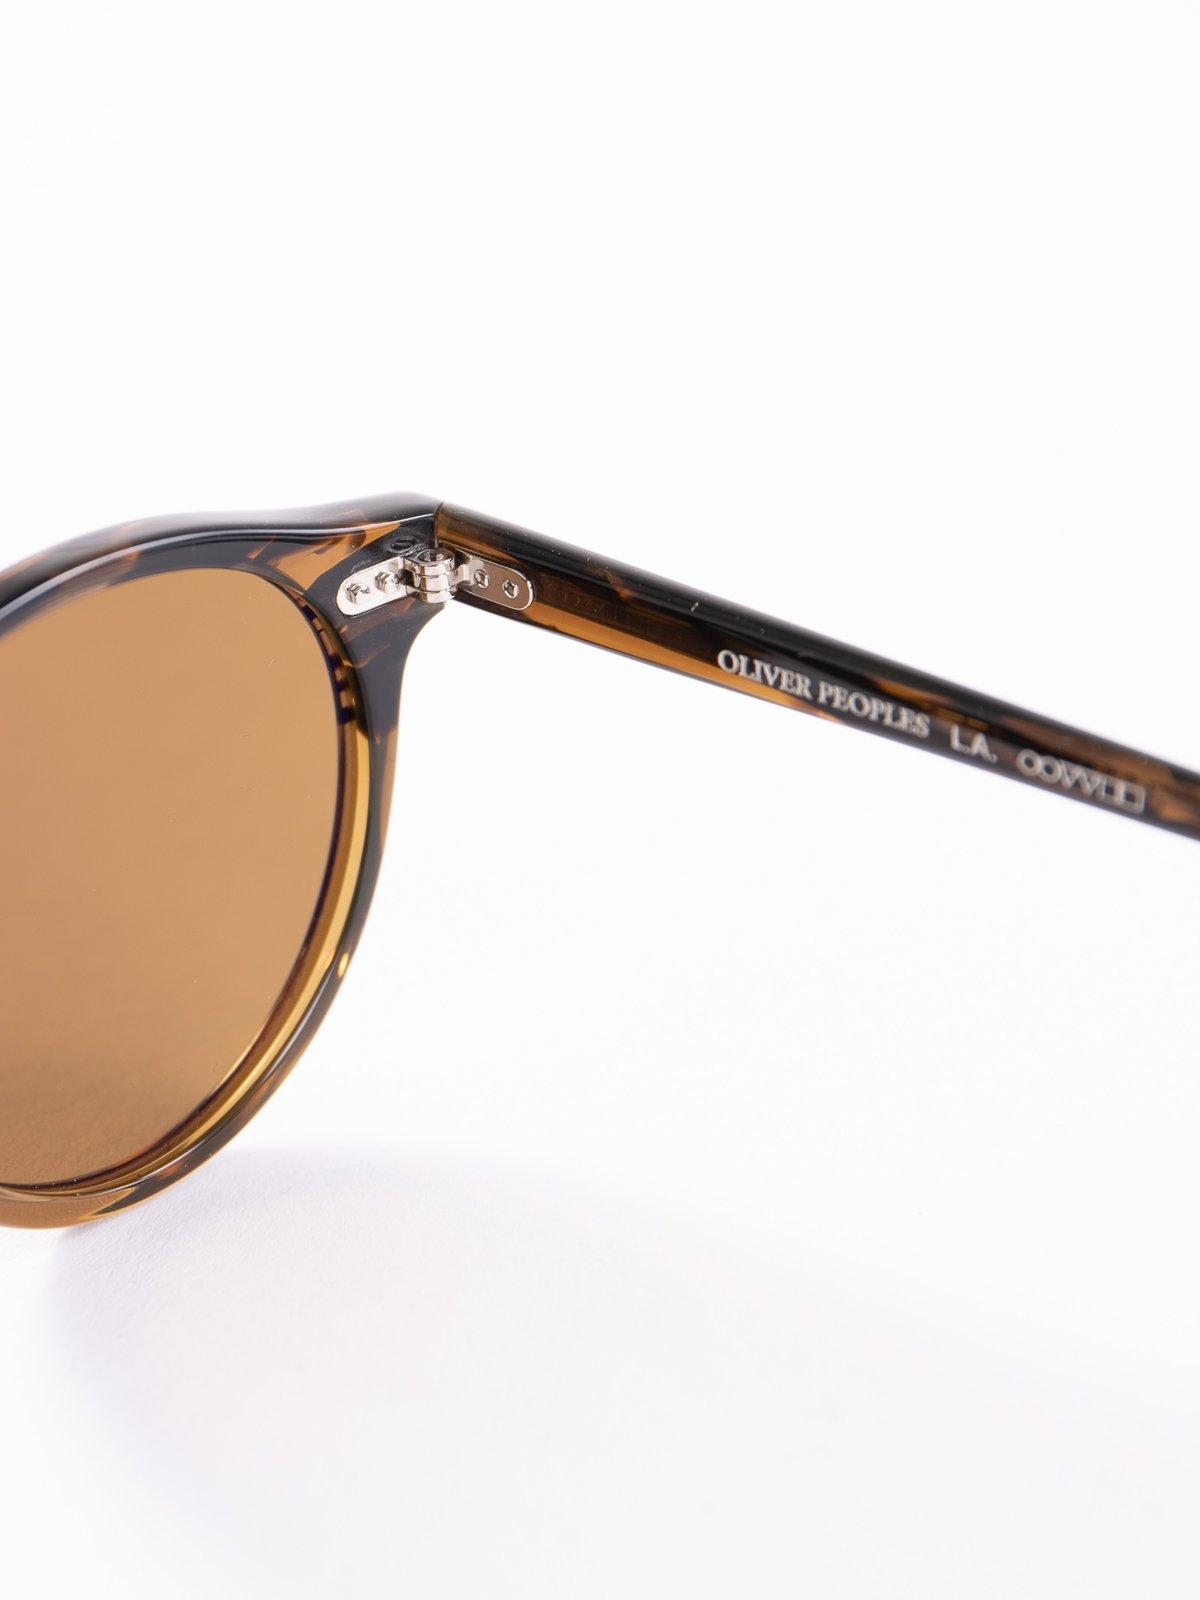 Tortoise/Brown Gregory Peck Sunglasses - Image 4